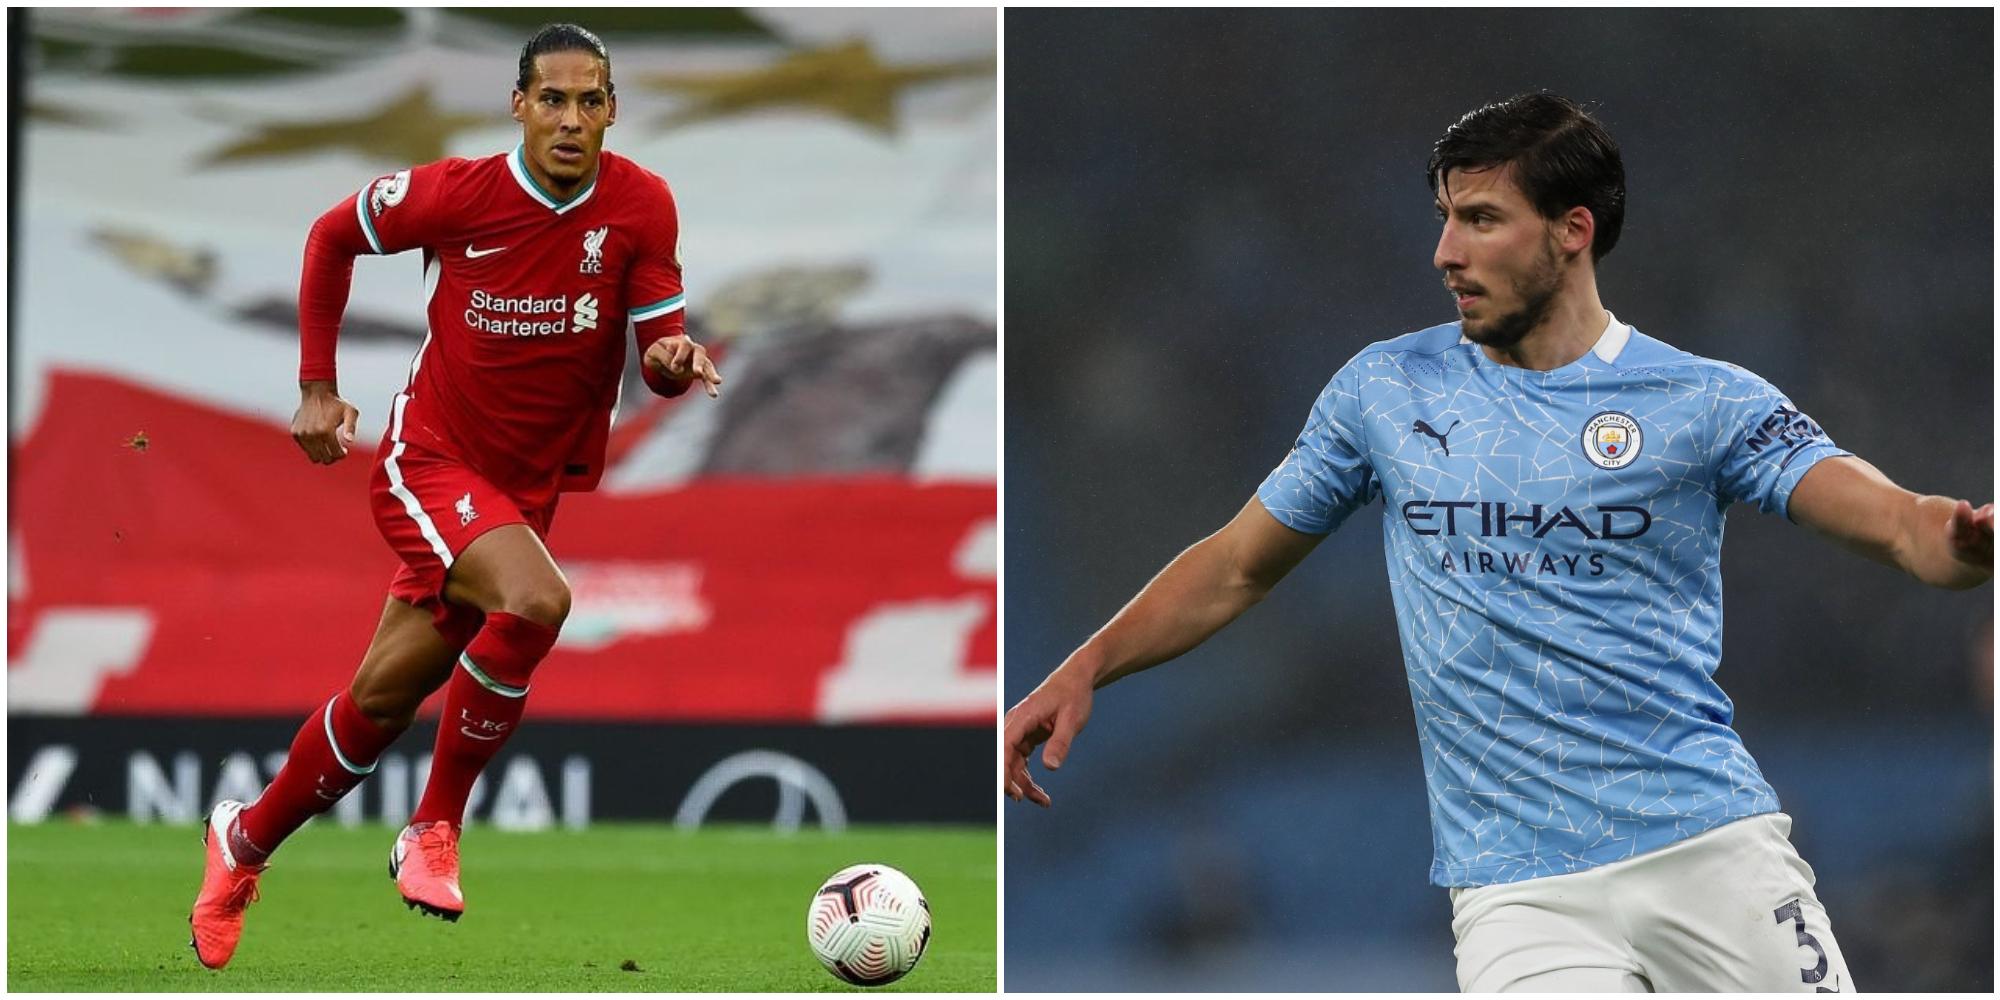 'Better than Van Dijk's impact on Liverpool' – Savage makes astonishing Dias/Van Dijk claim